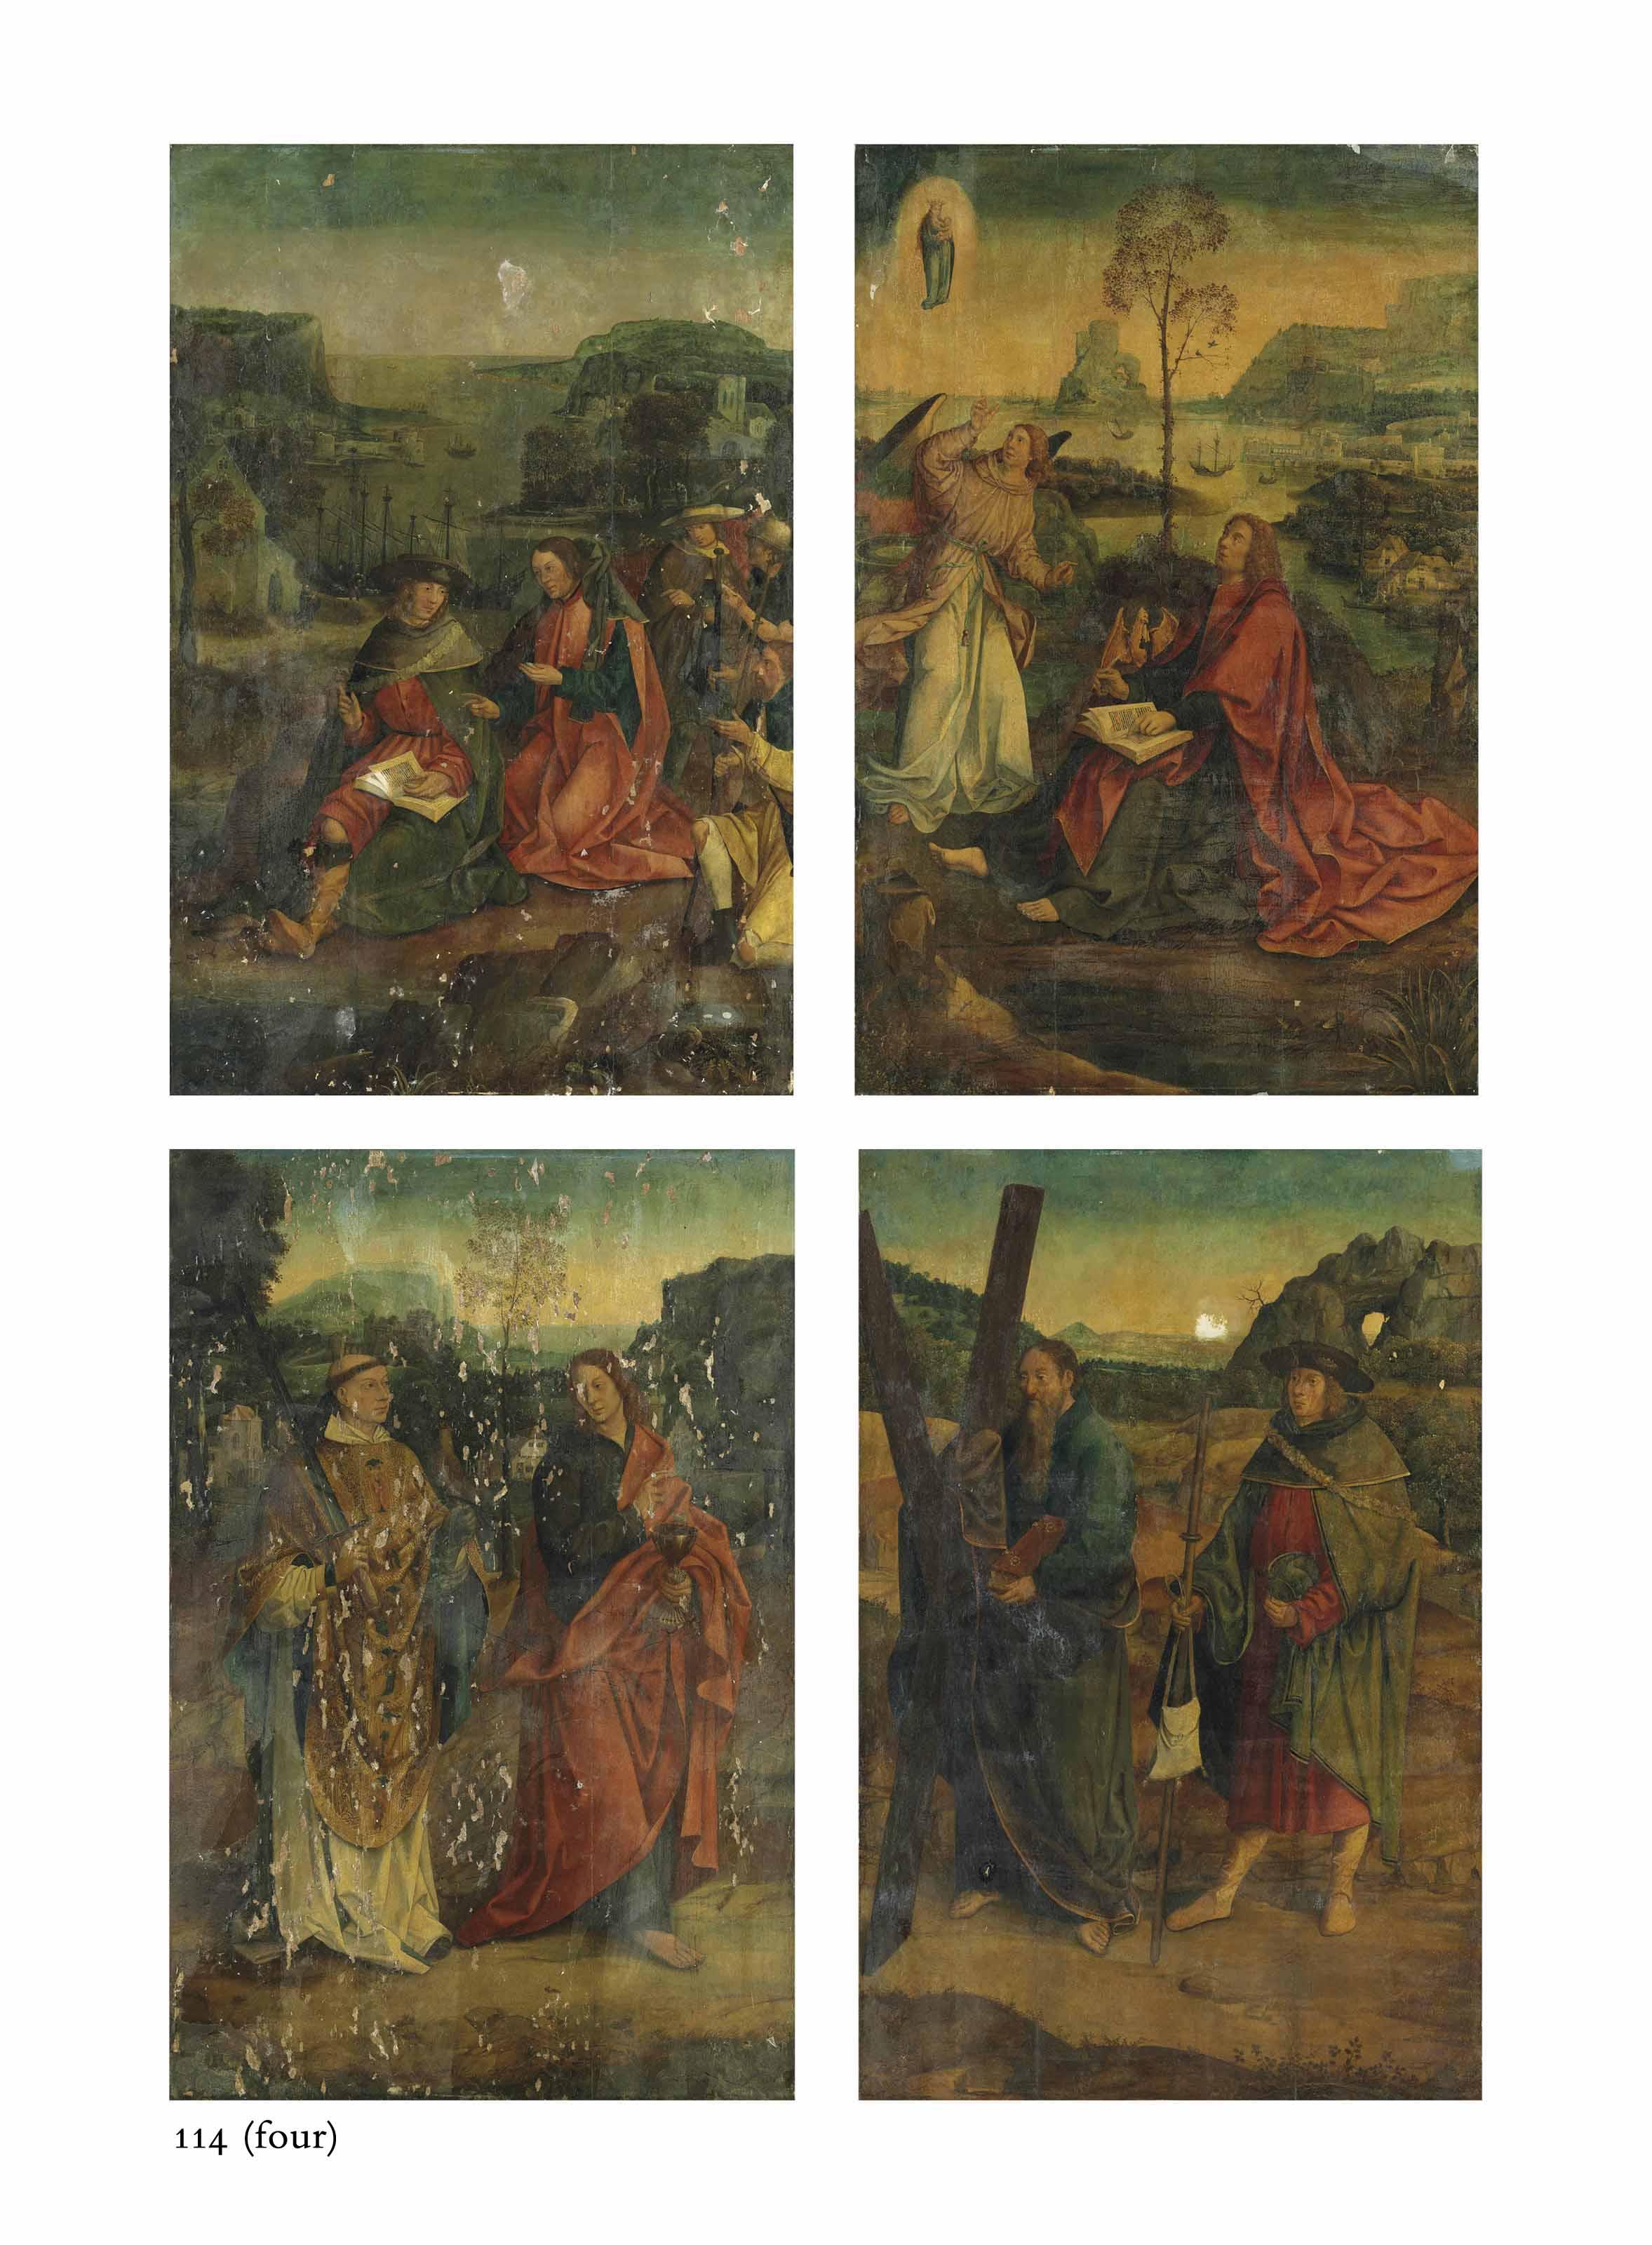 Four wings from an altarpiece: Saint James Preaching; Saint John the Evangelist on Patmos; Saints Barvo and John the Evangelist; and Saints Andrew and James